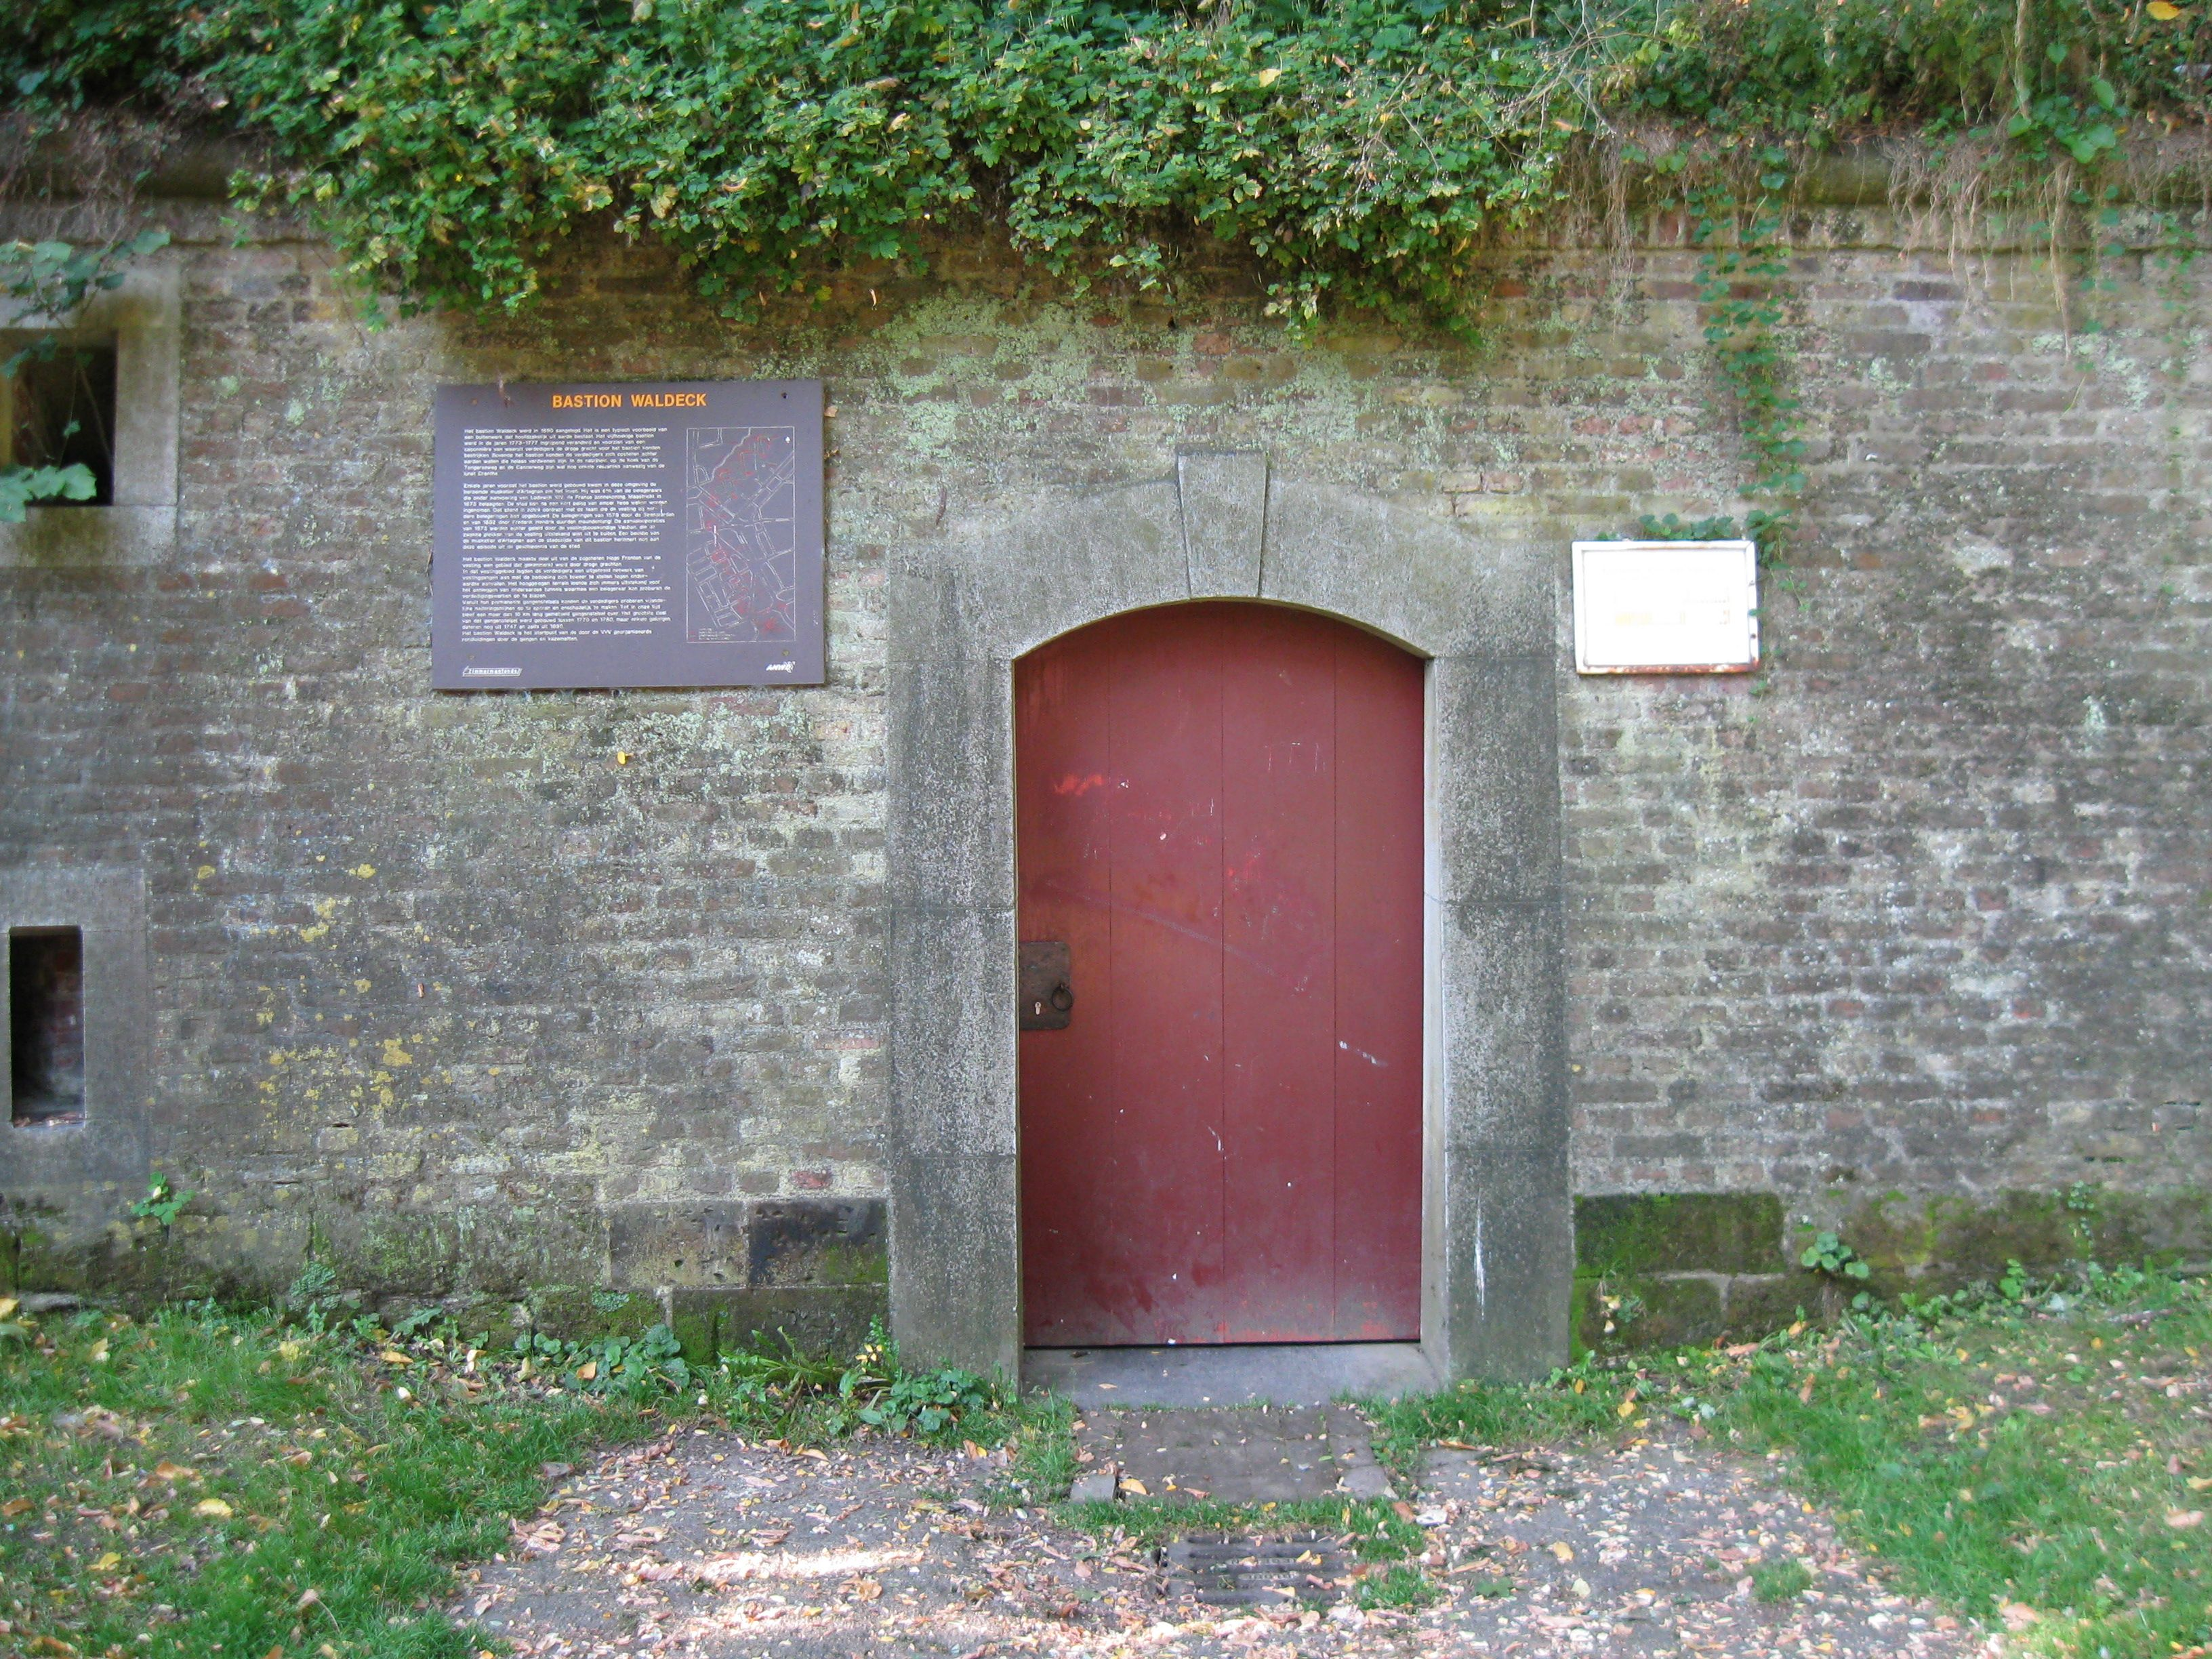 Bastion Waldeck